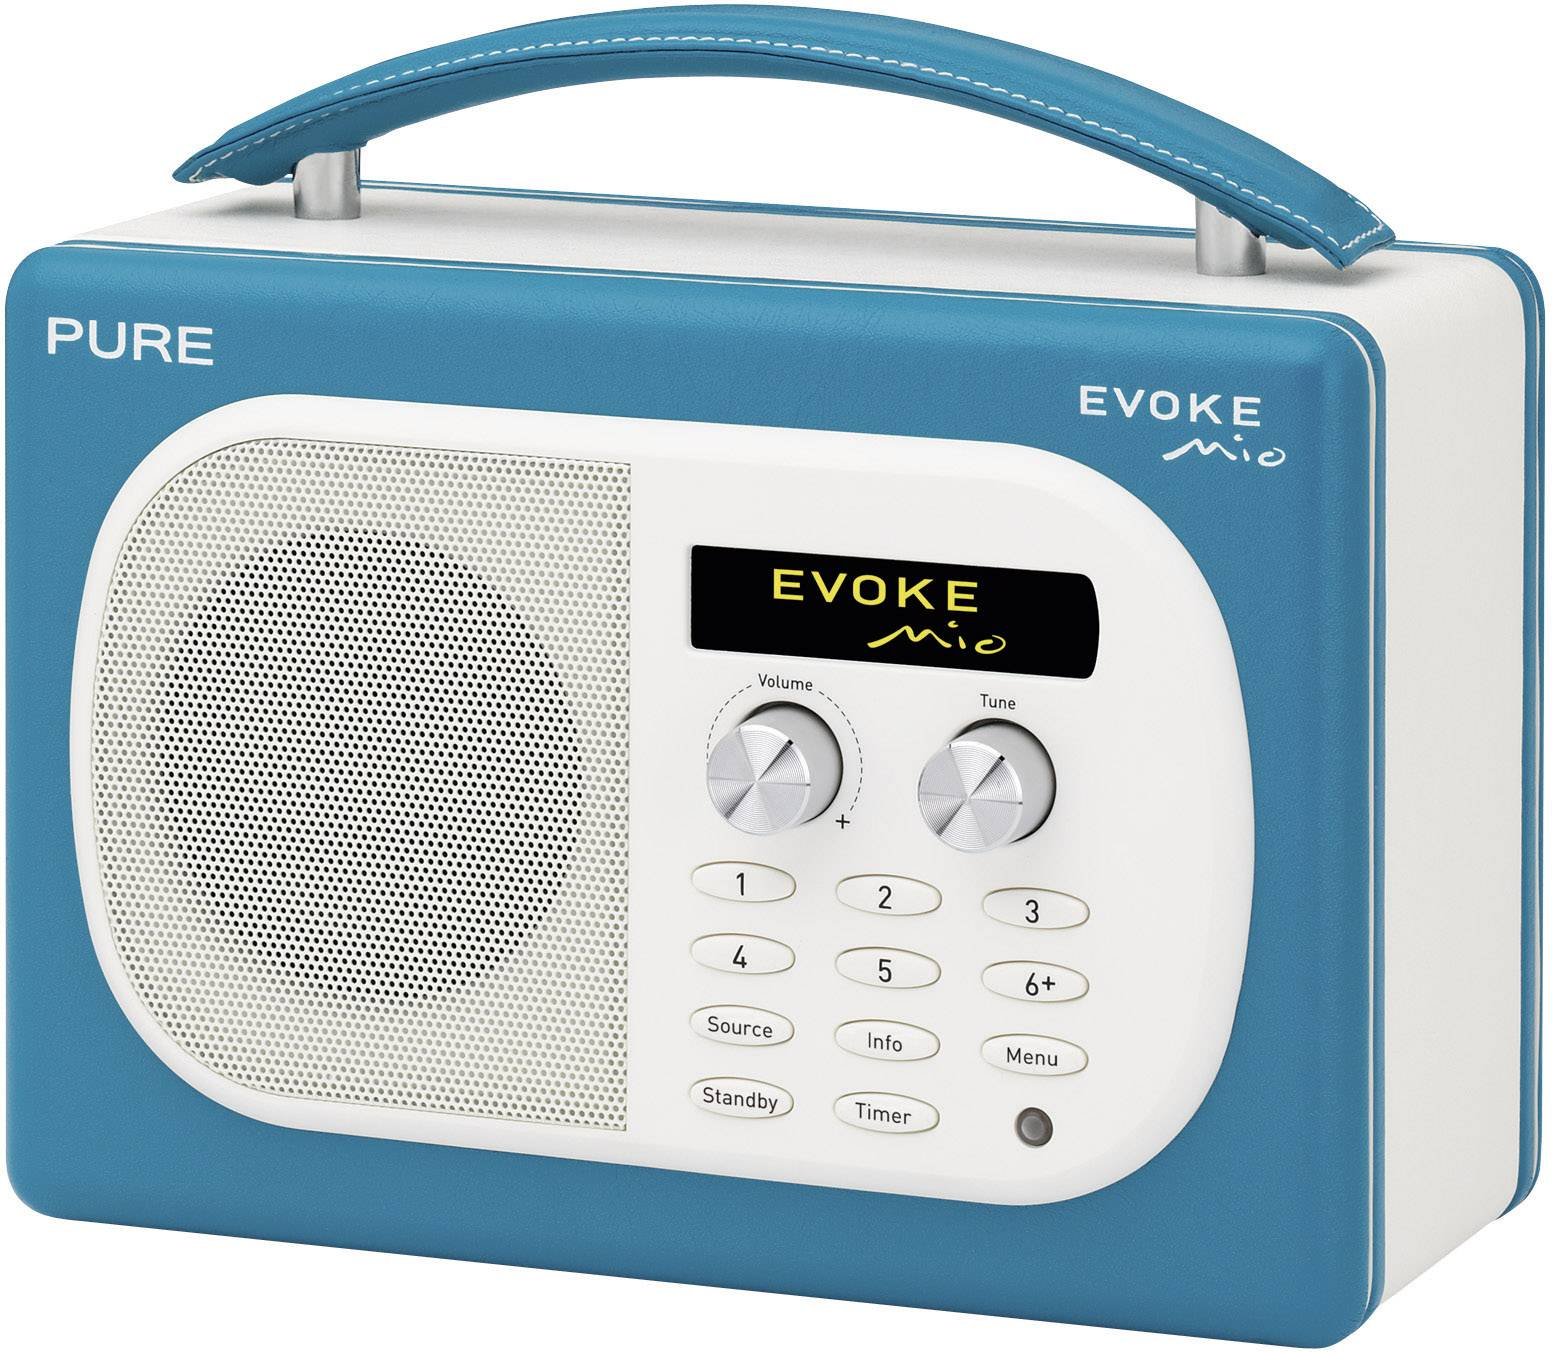 Bon Pure EVOKE Mio, Teal Bathroom Radio, Turquoise